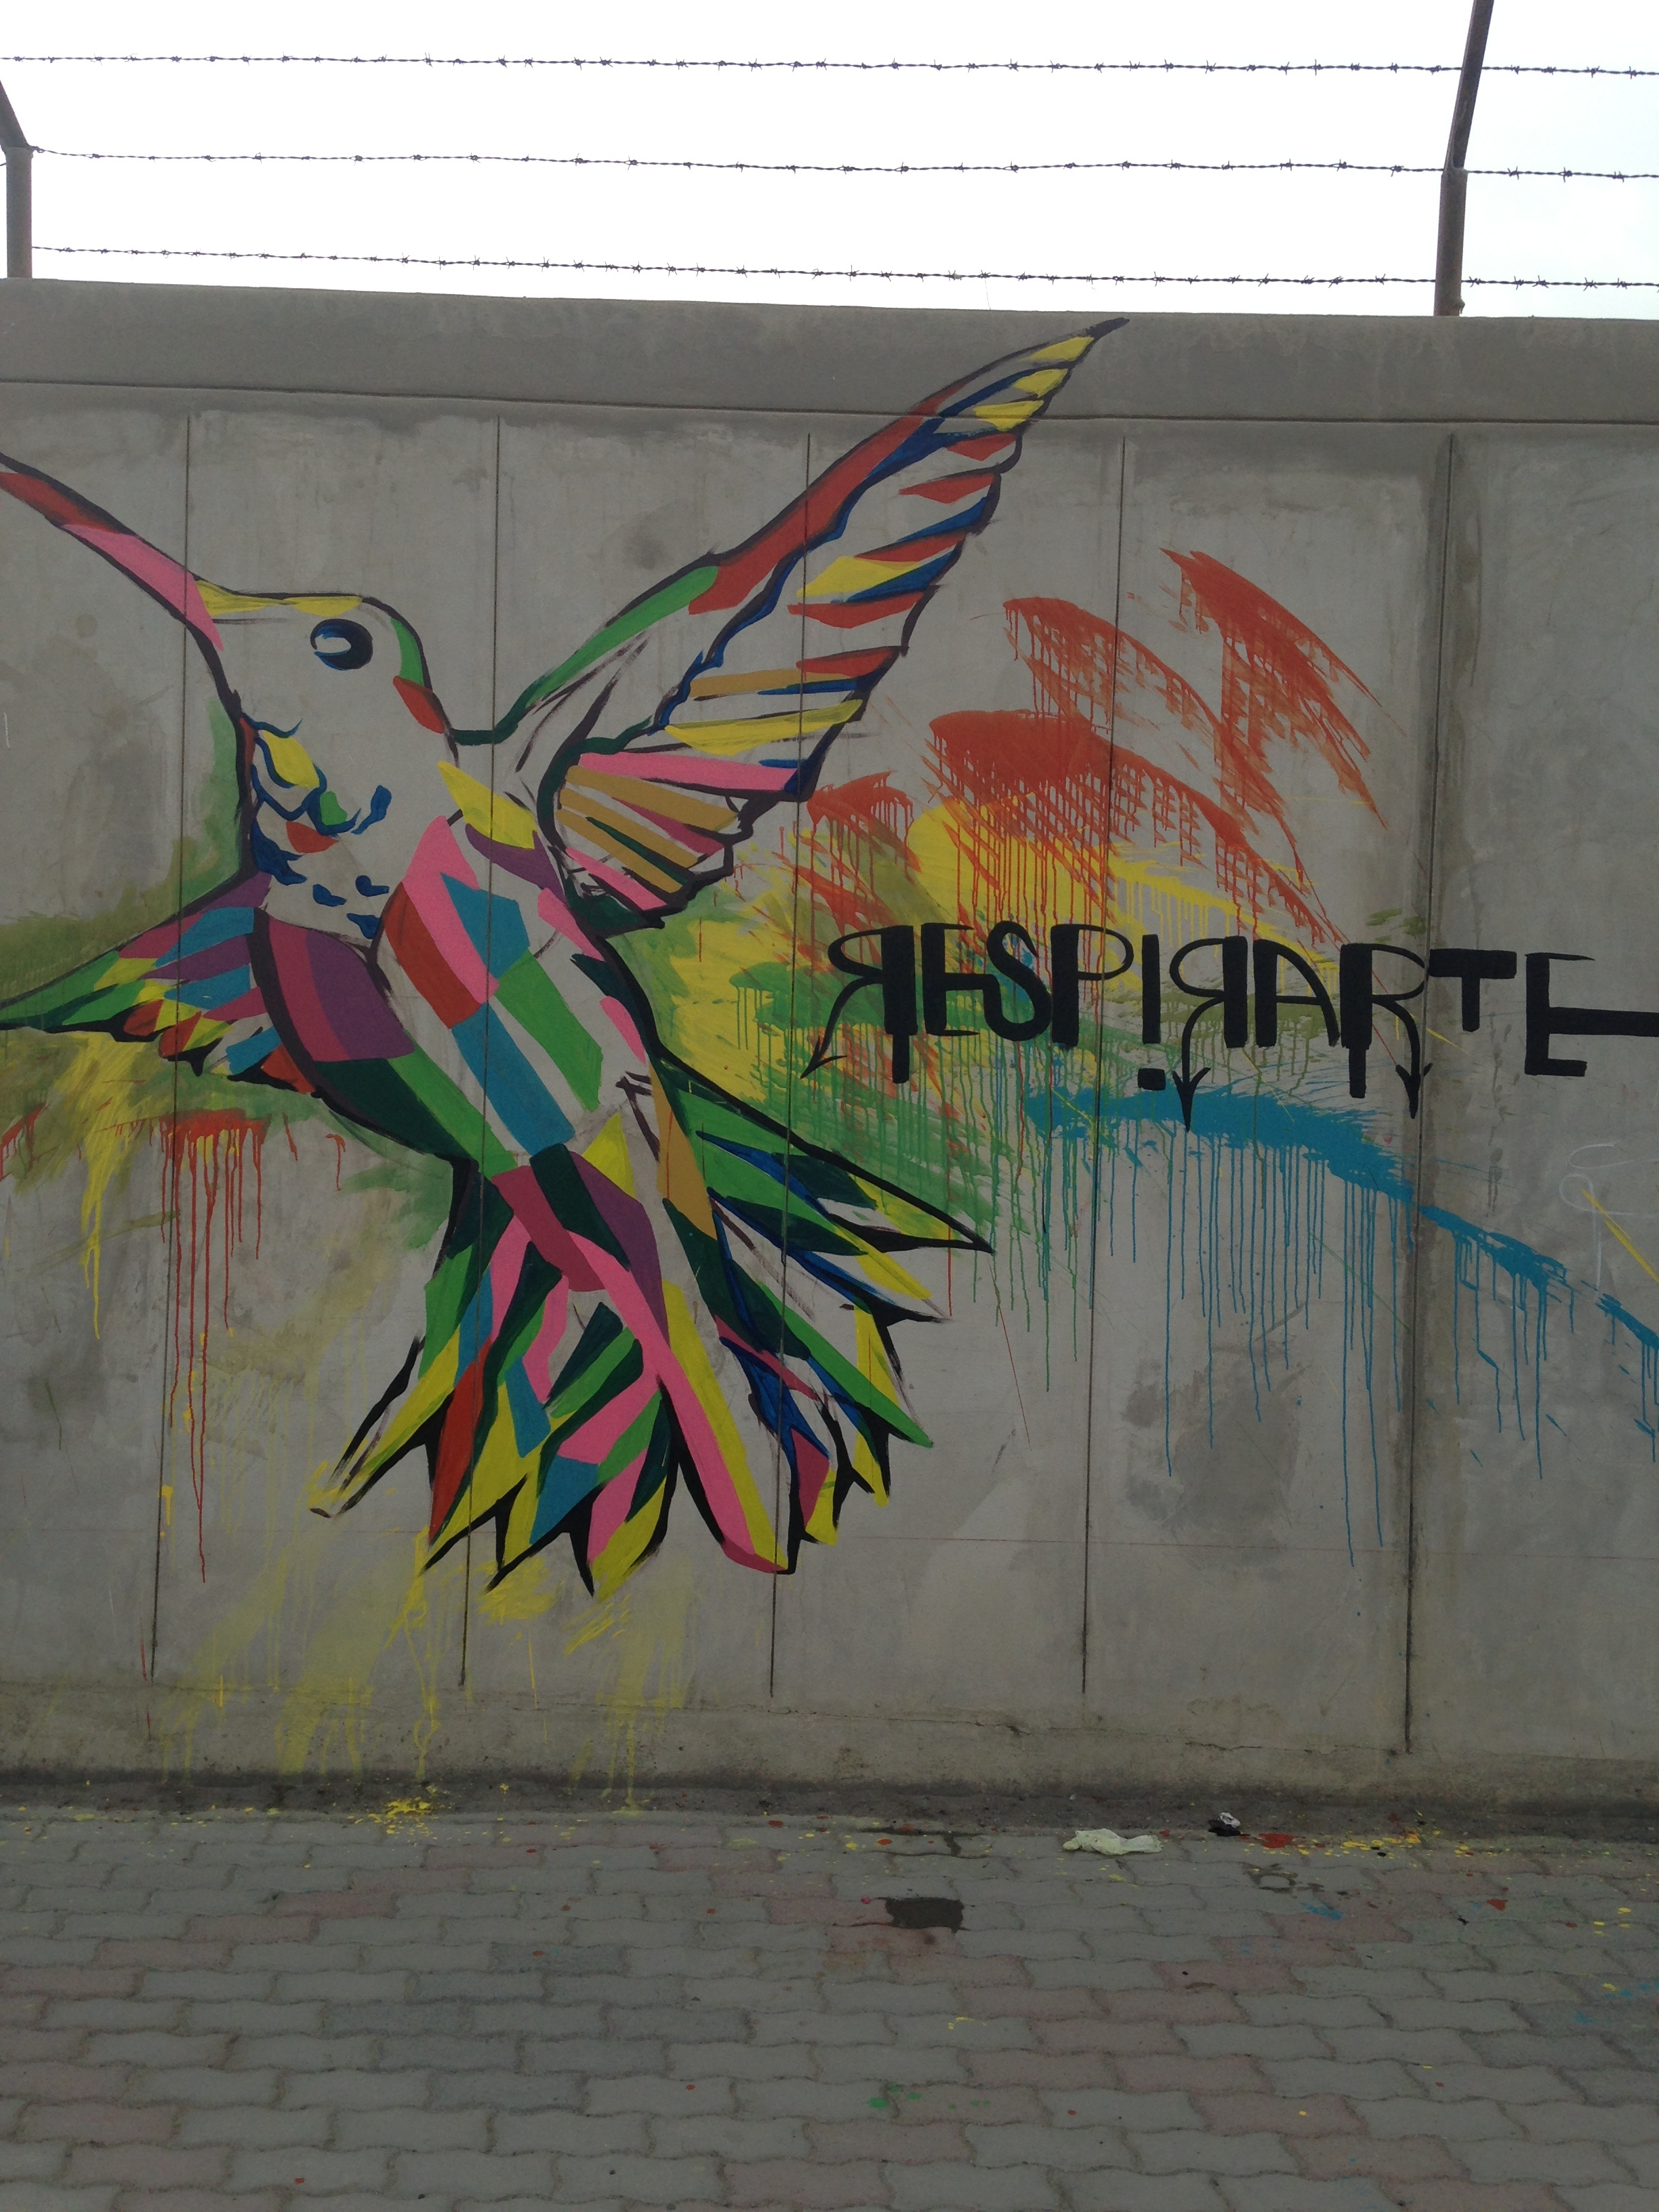 The vivacious hummingbird